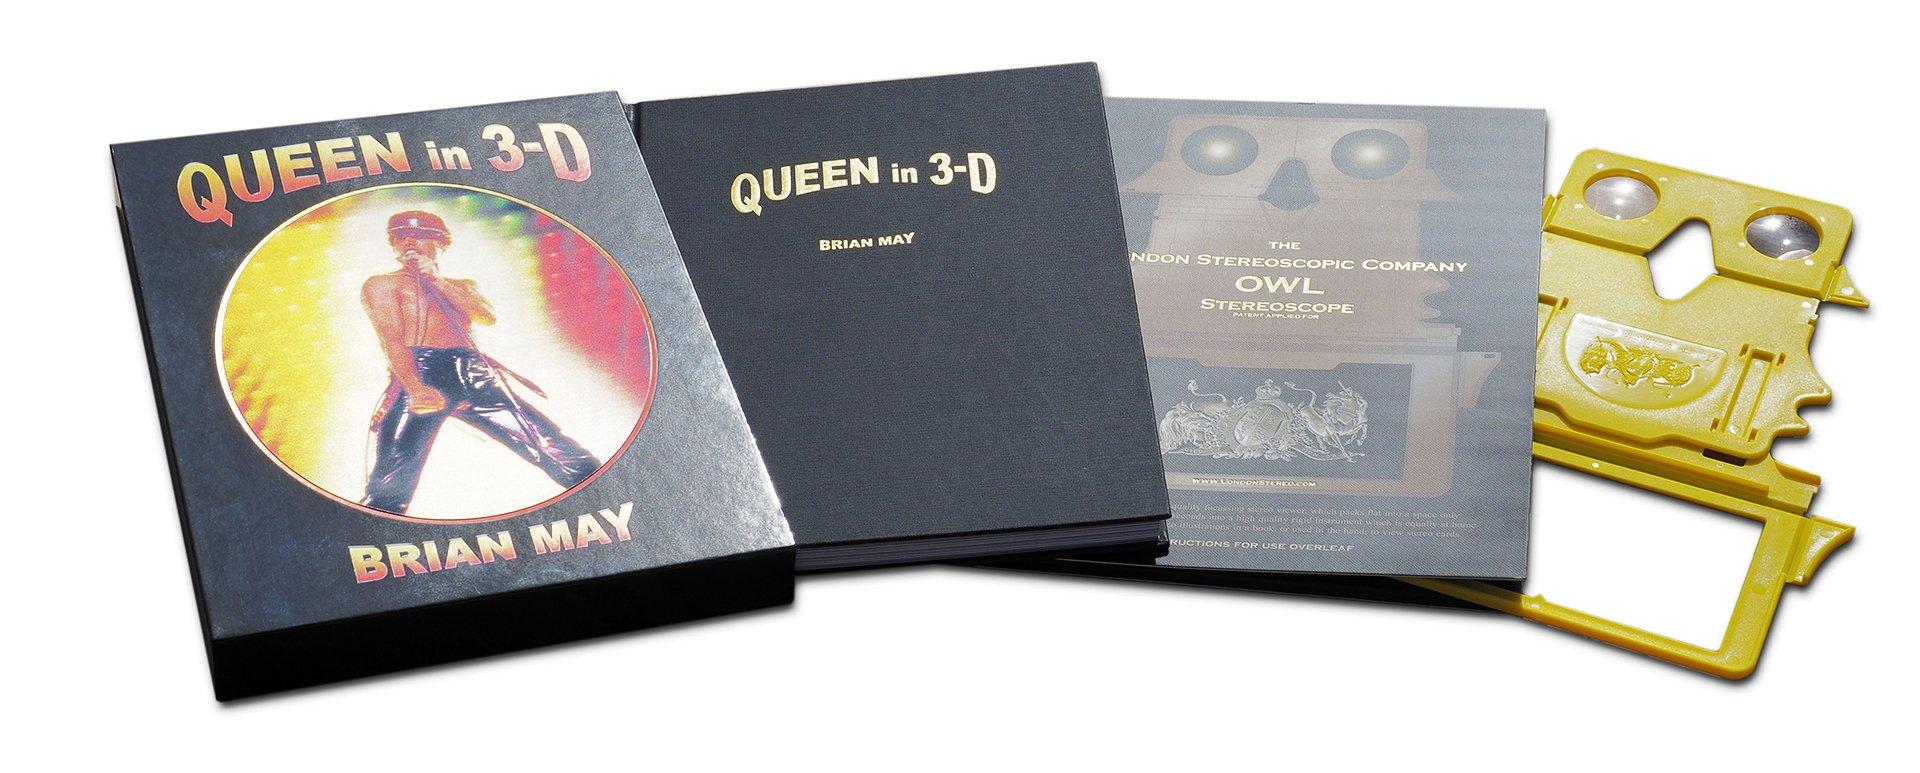 Brian May izdaje 3D knjigu o Queenu